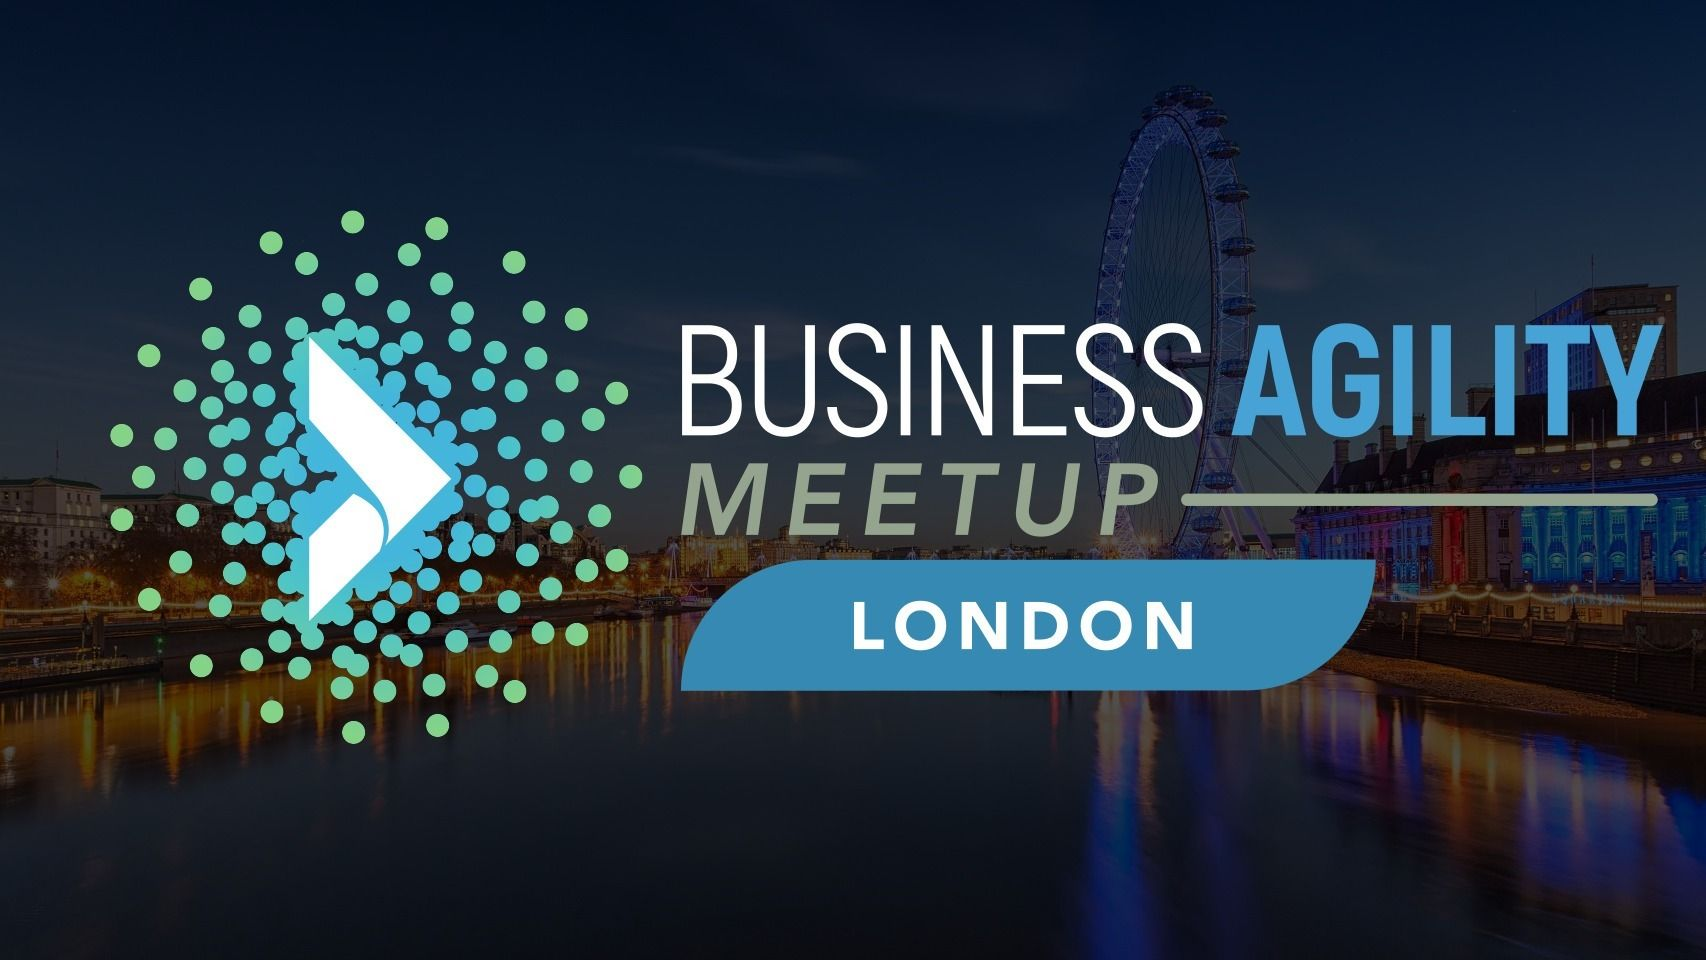 Business Agility Meetup - London